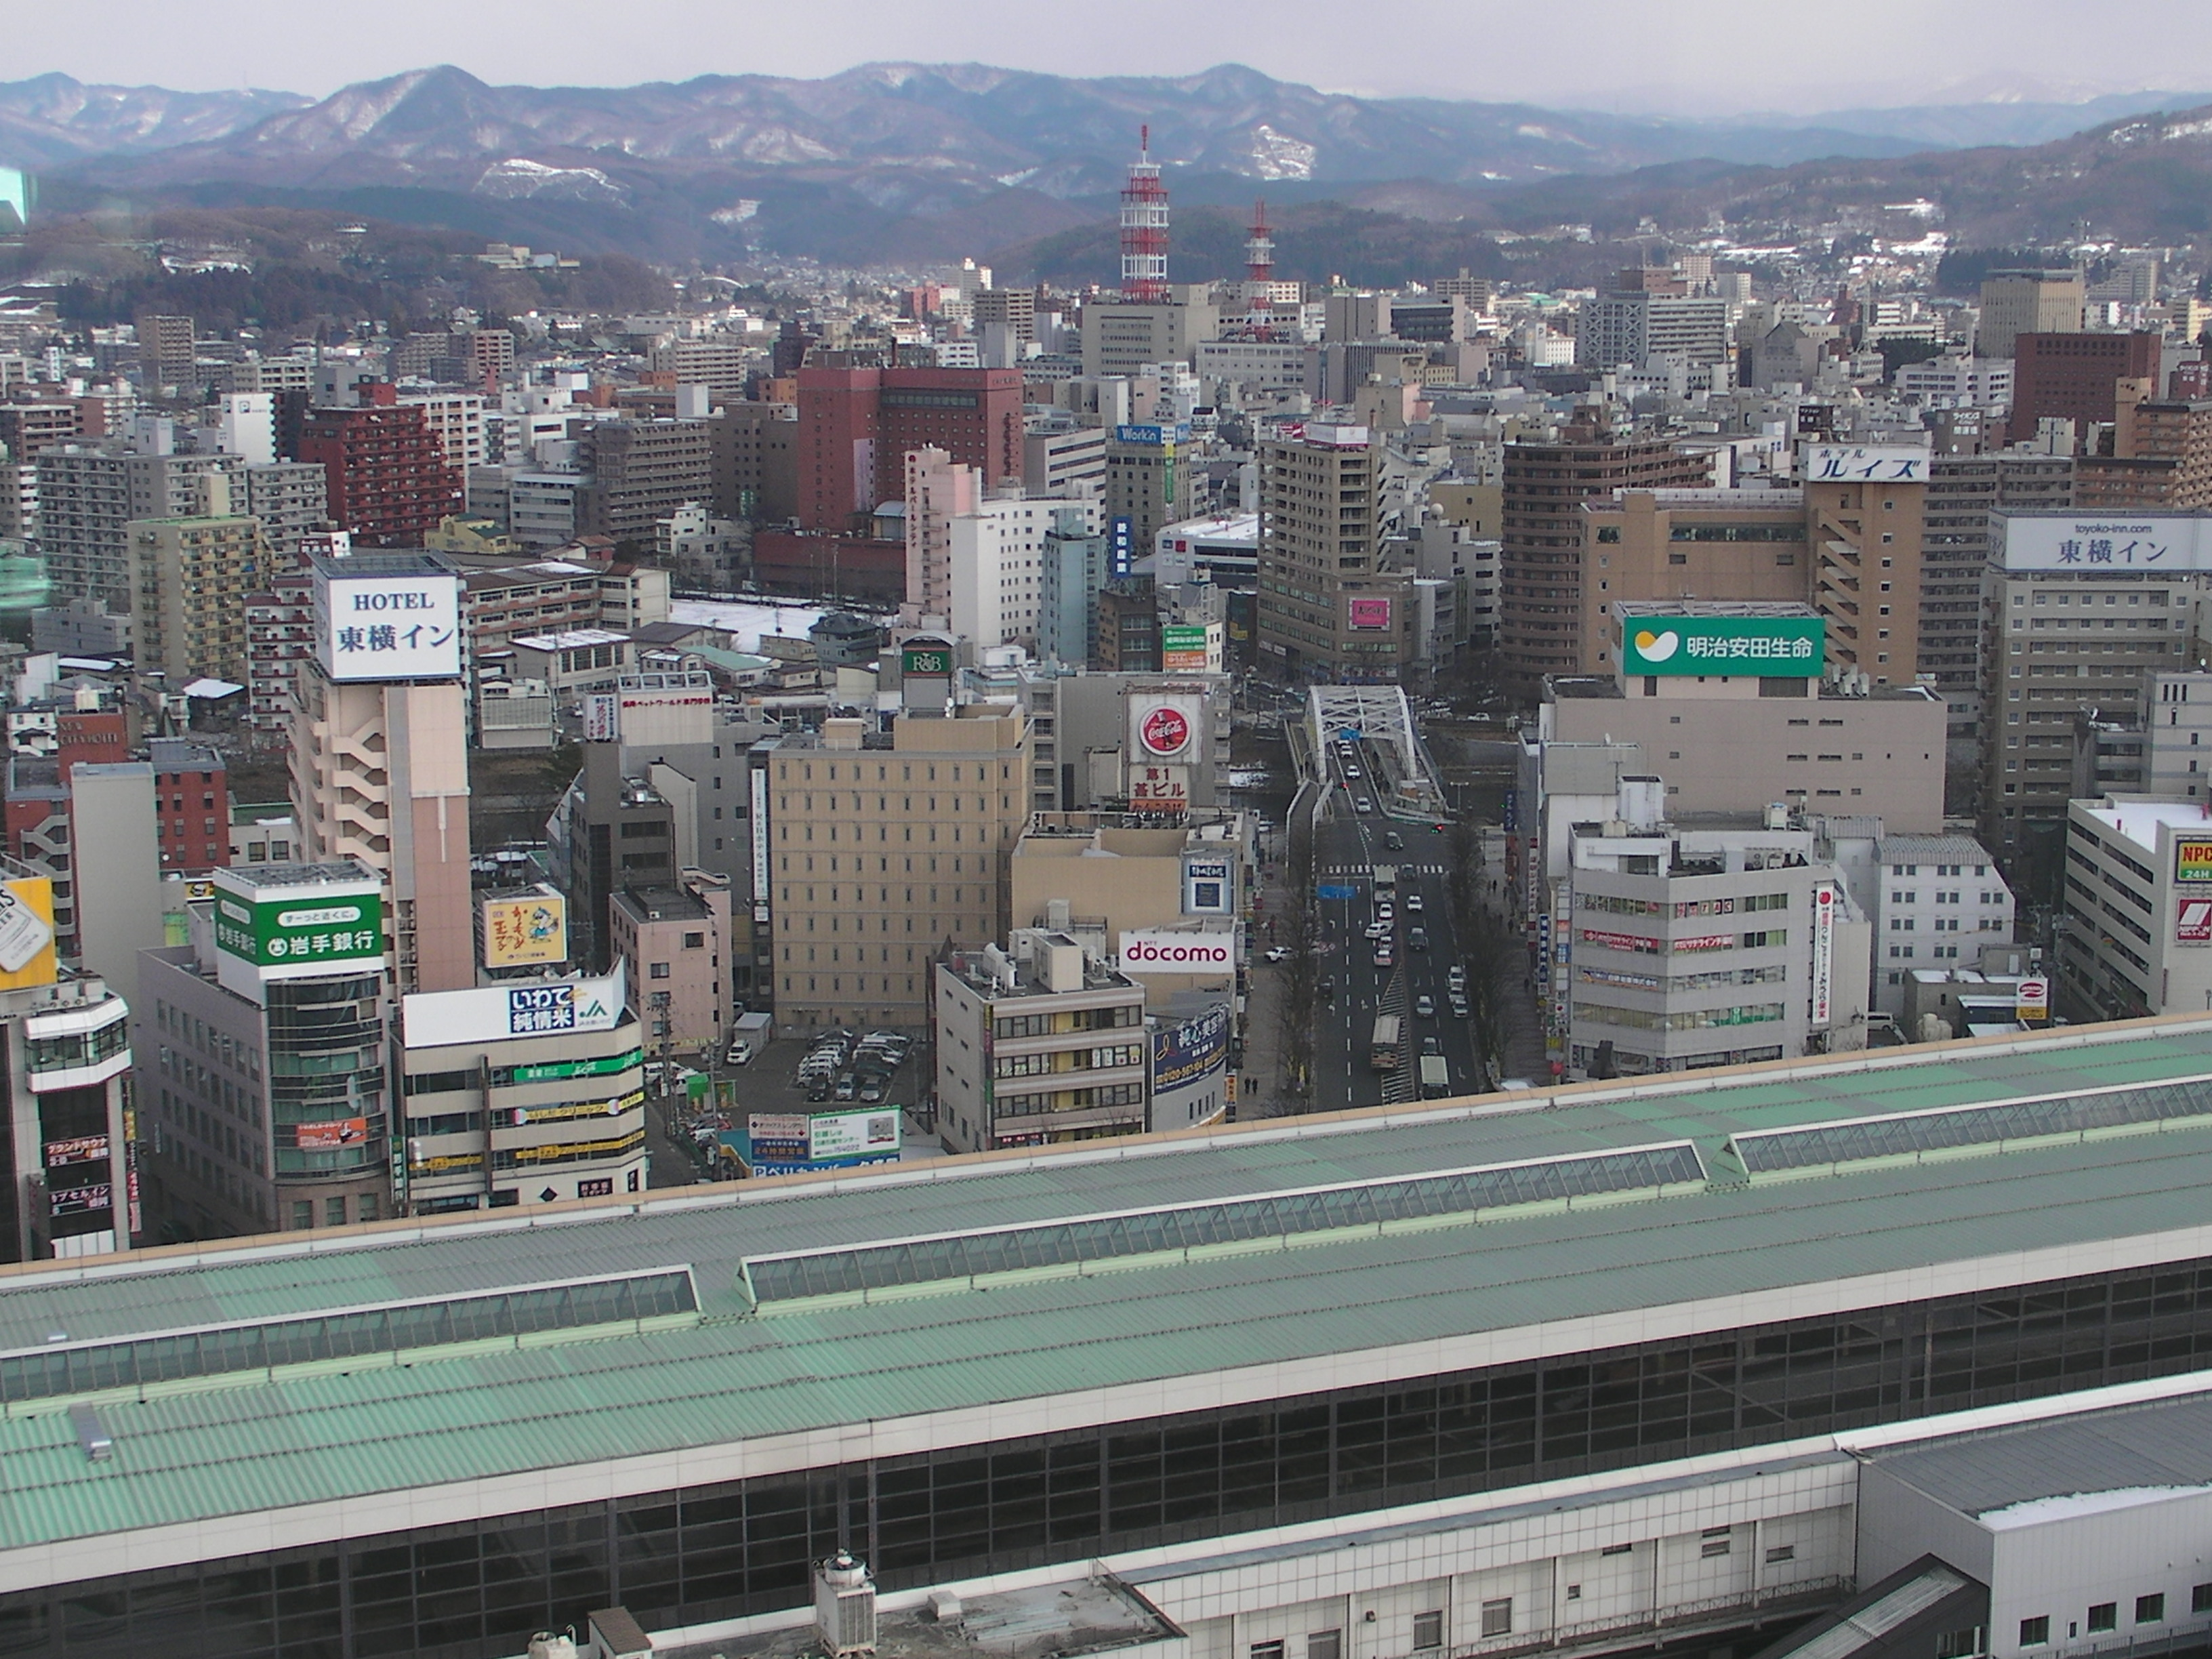 盛岡市 - Morioka, IwateForgot Password